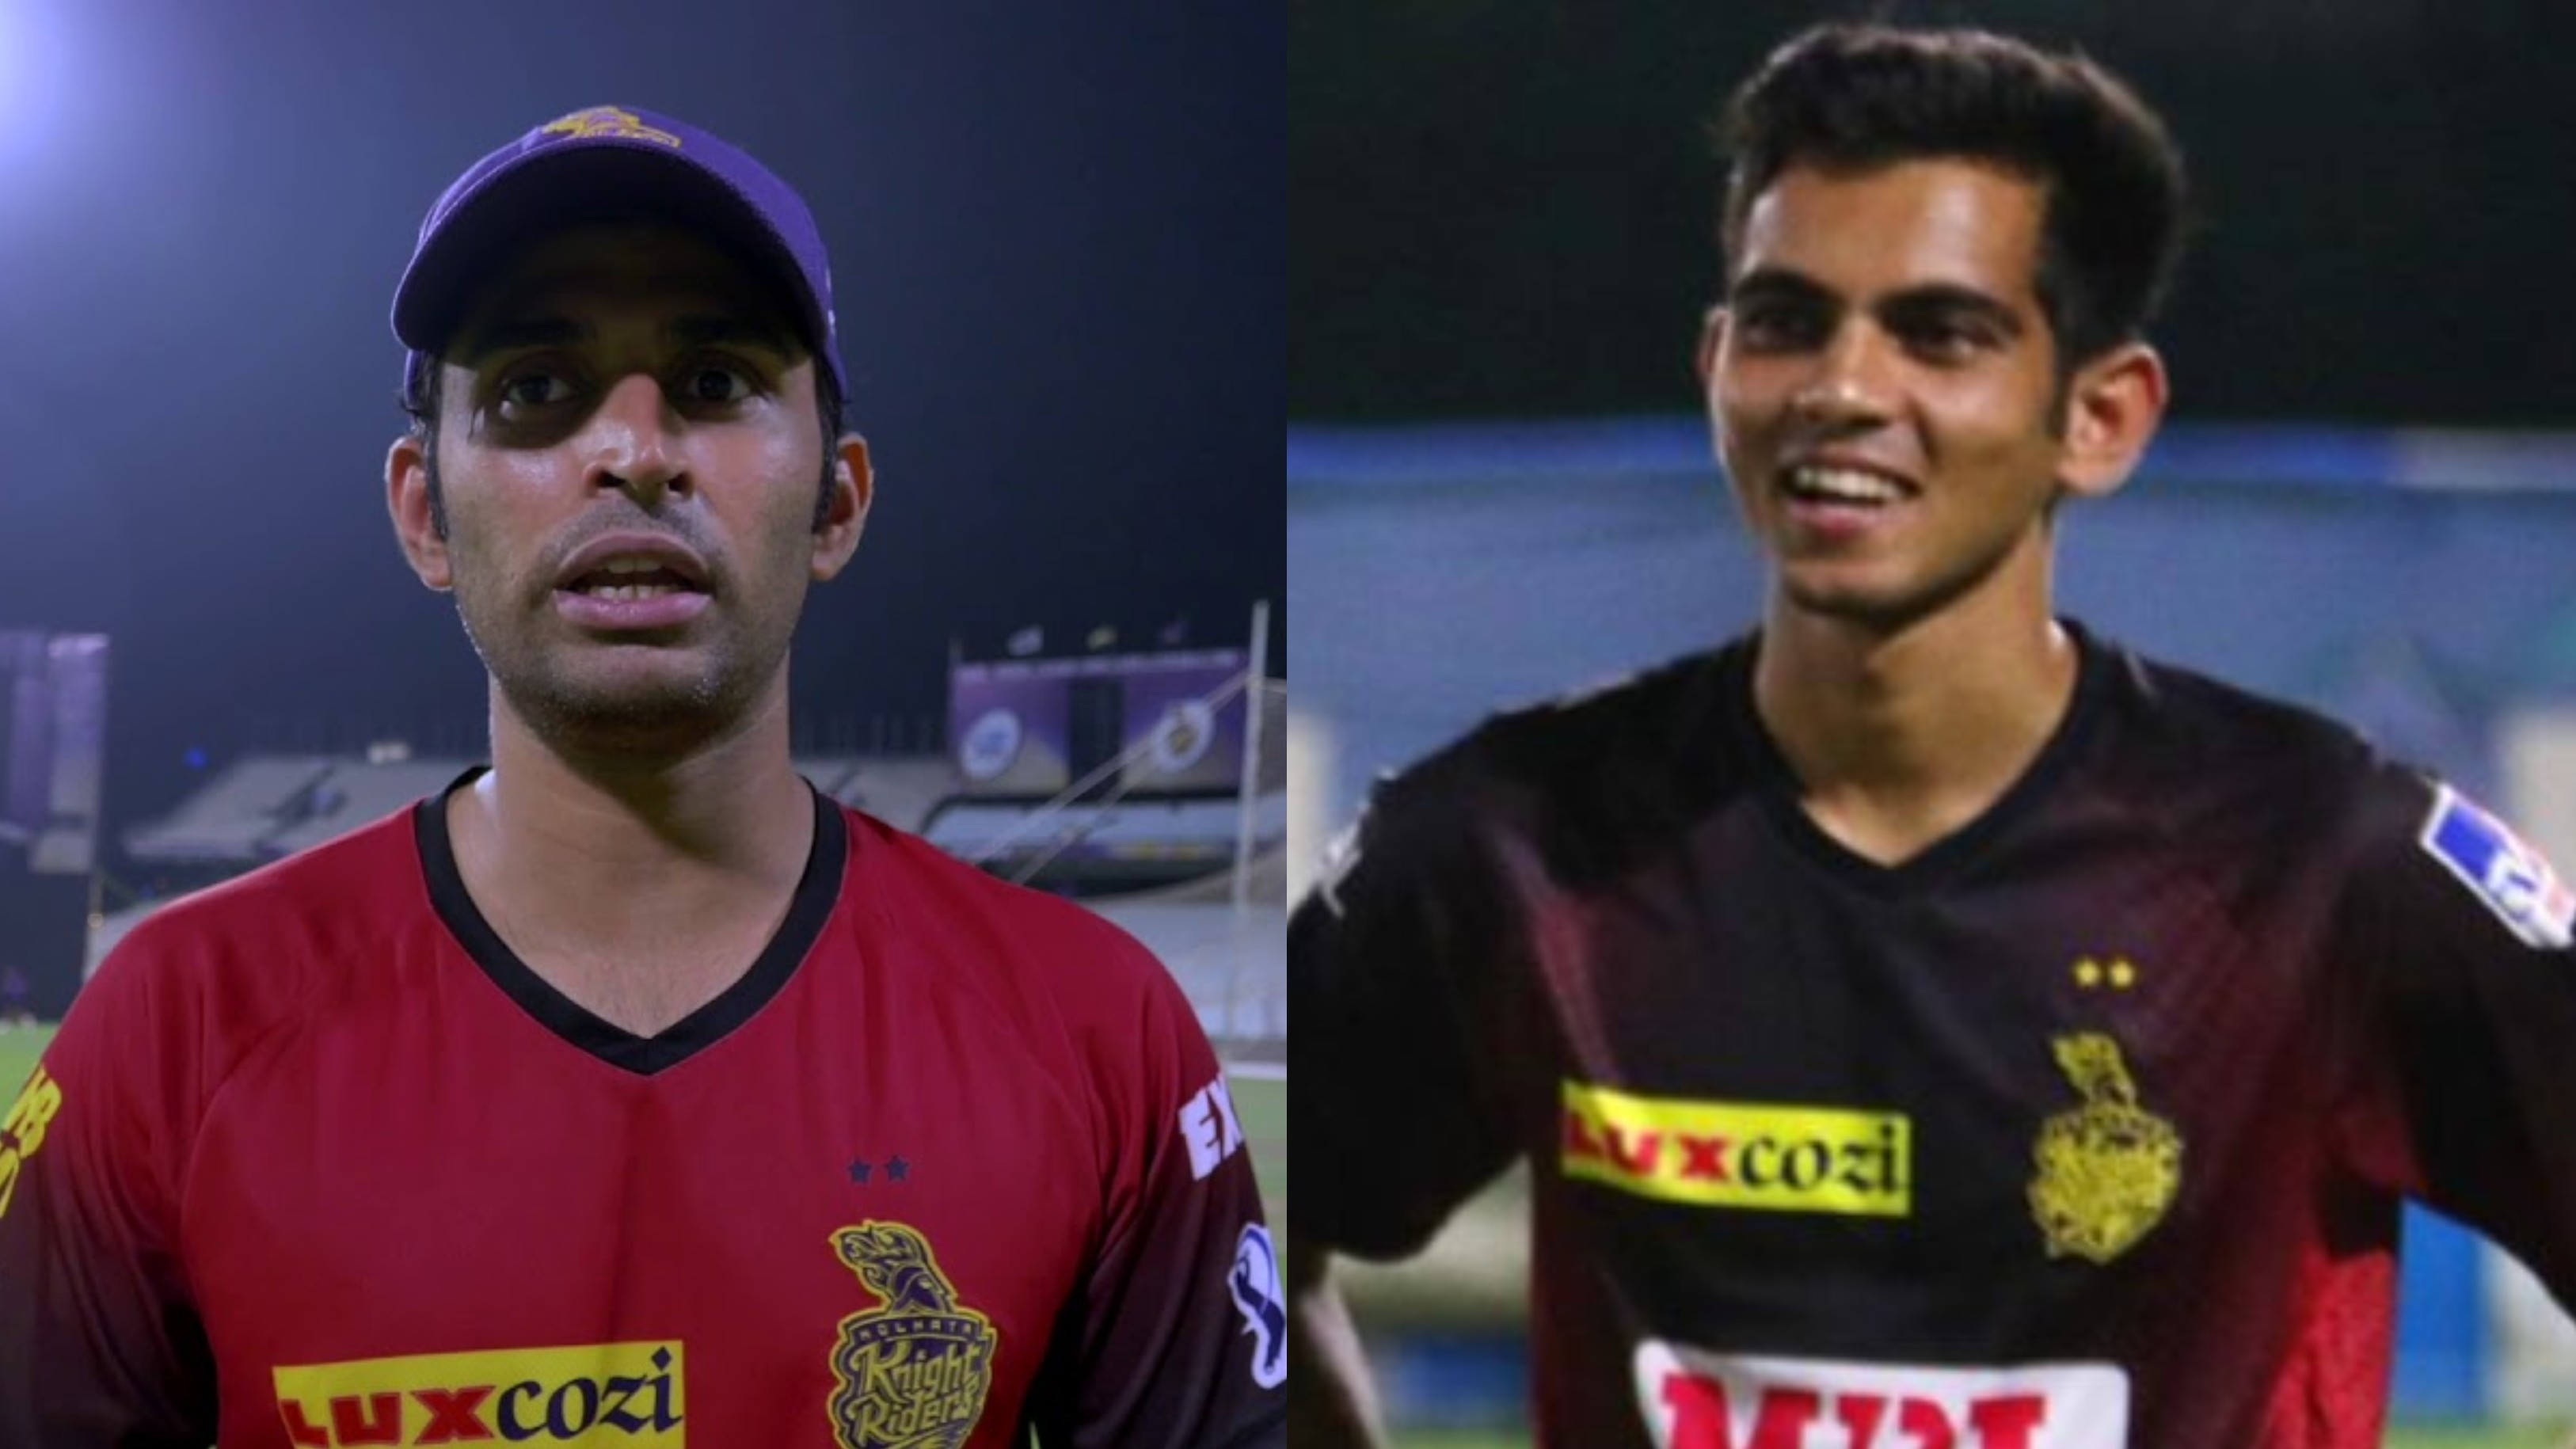 IPL 2020: Pleased to see Kamlesh Nagarkoti finally getting to play after 2 years: Abhishek Nayar